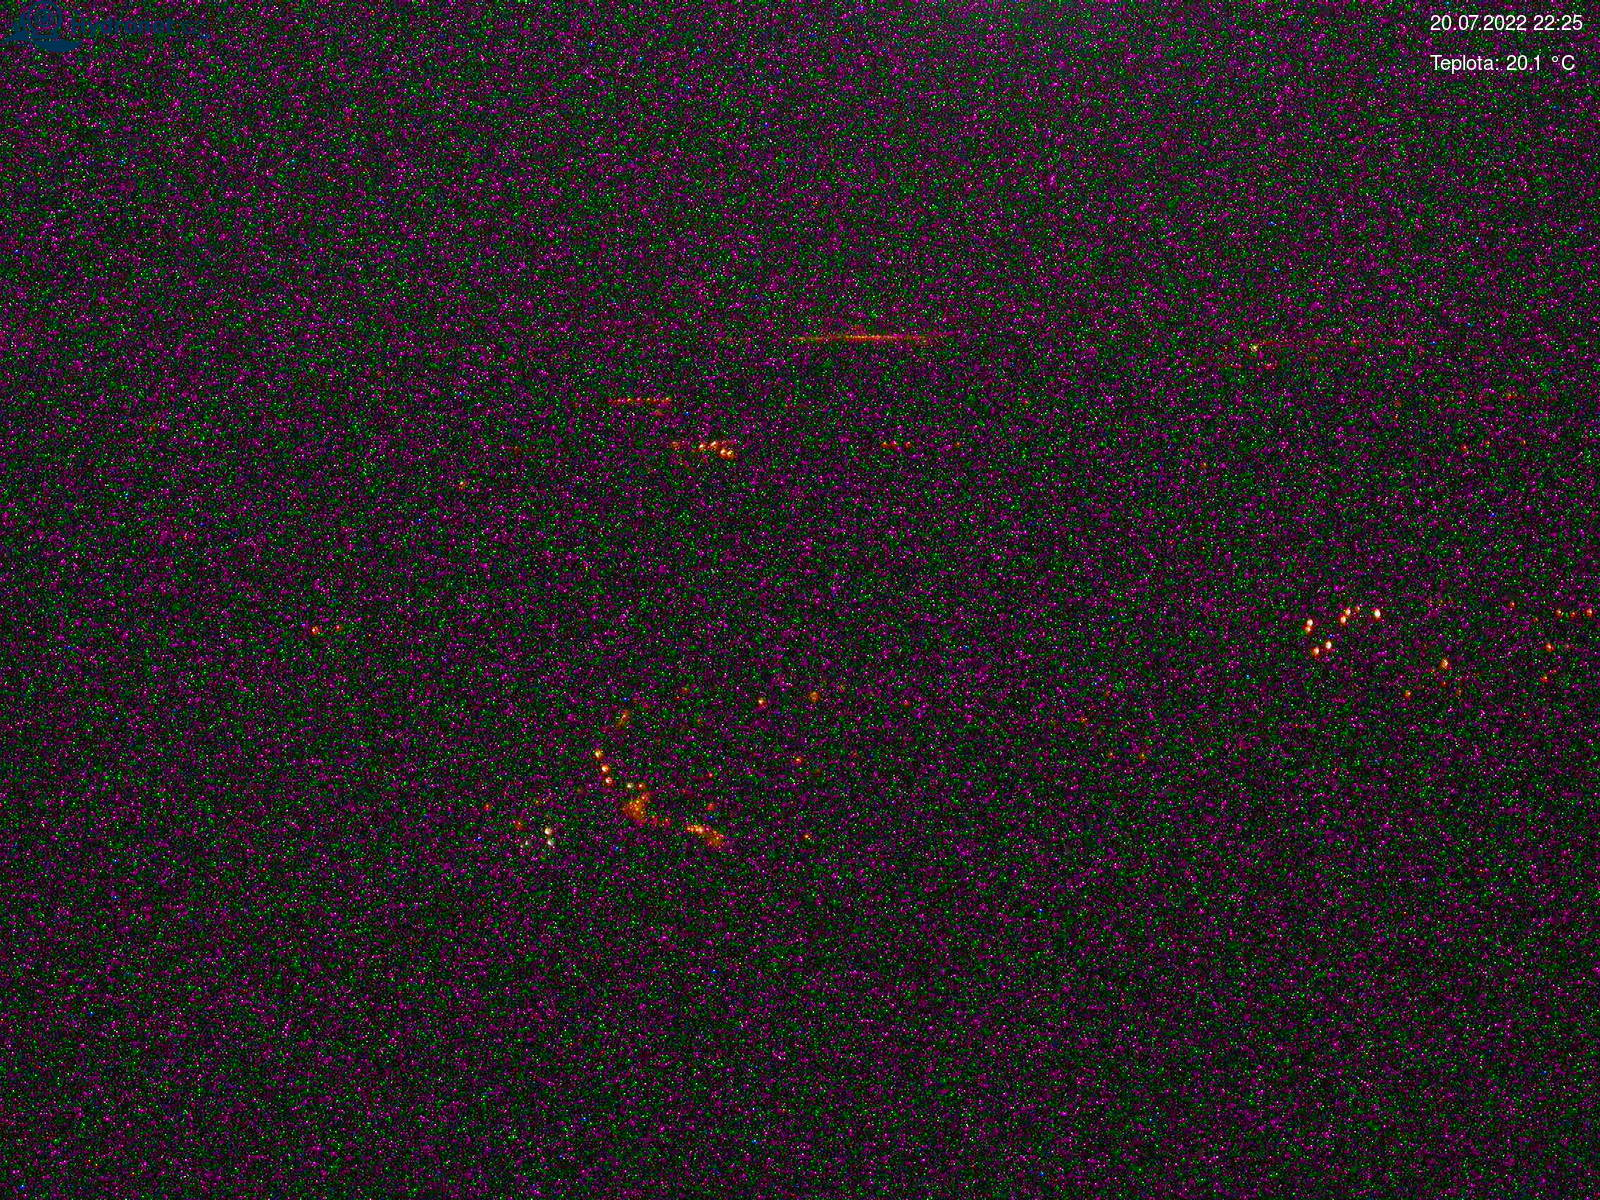 Webcam Ski Resort Rokytnice n. Jizerou cam 7 - Giant Mountains